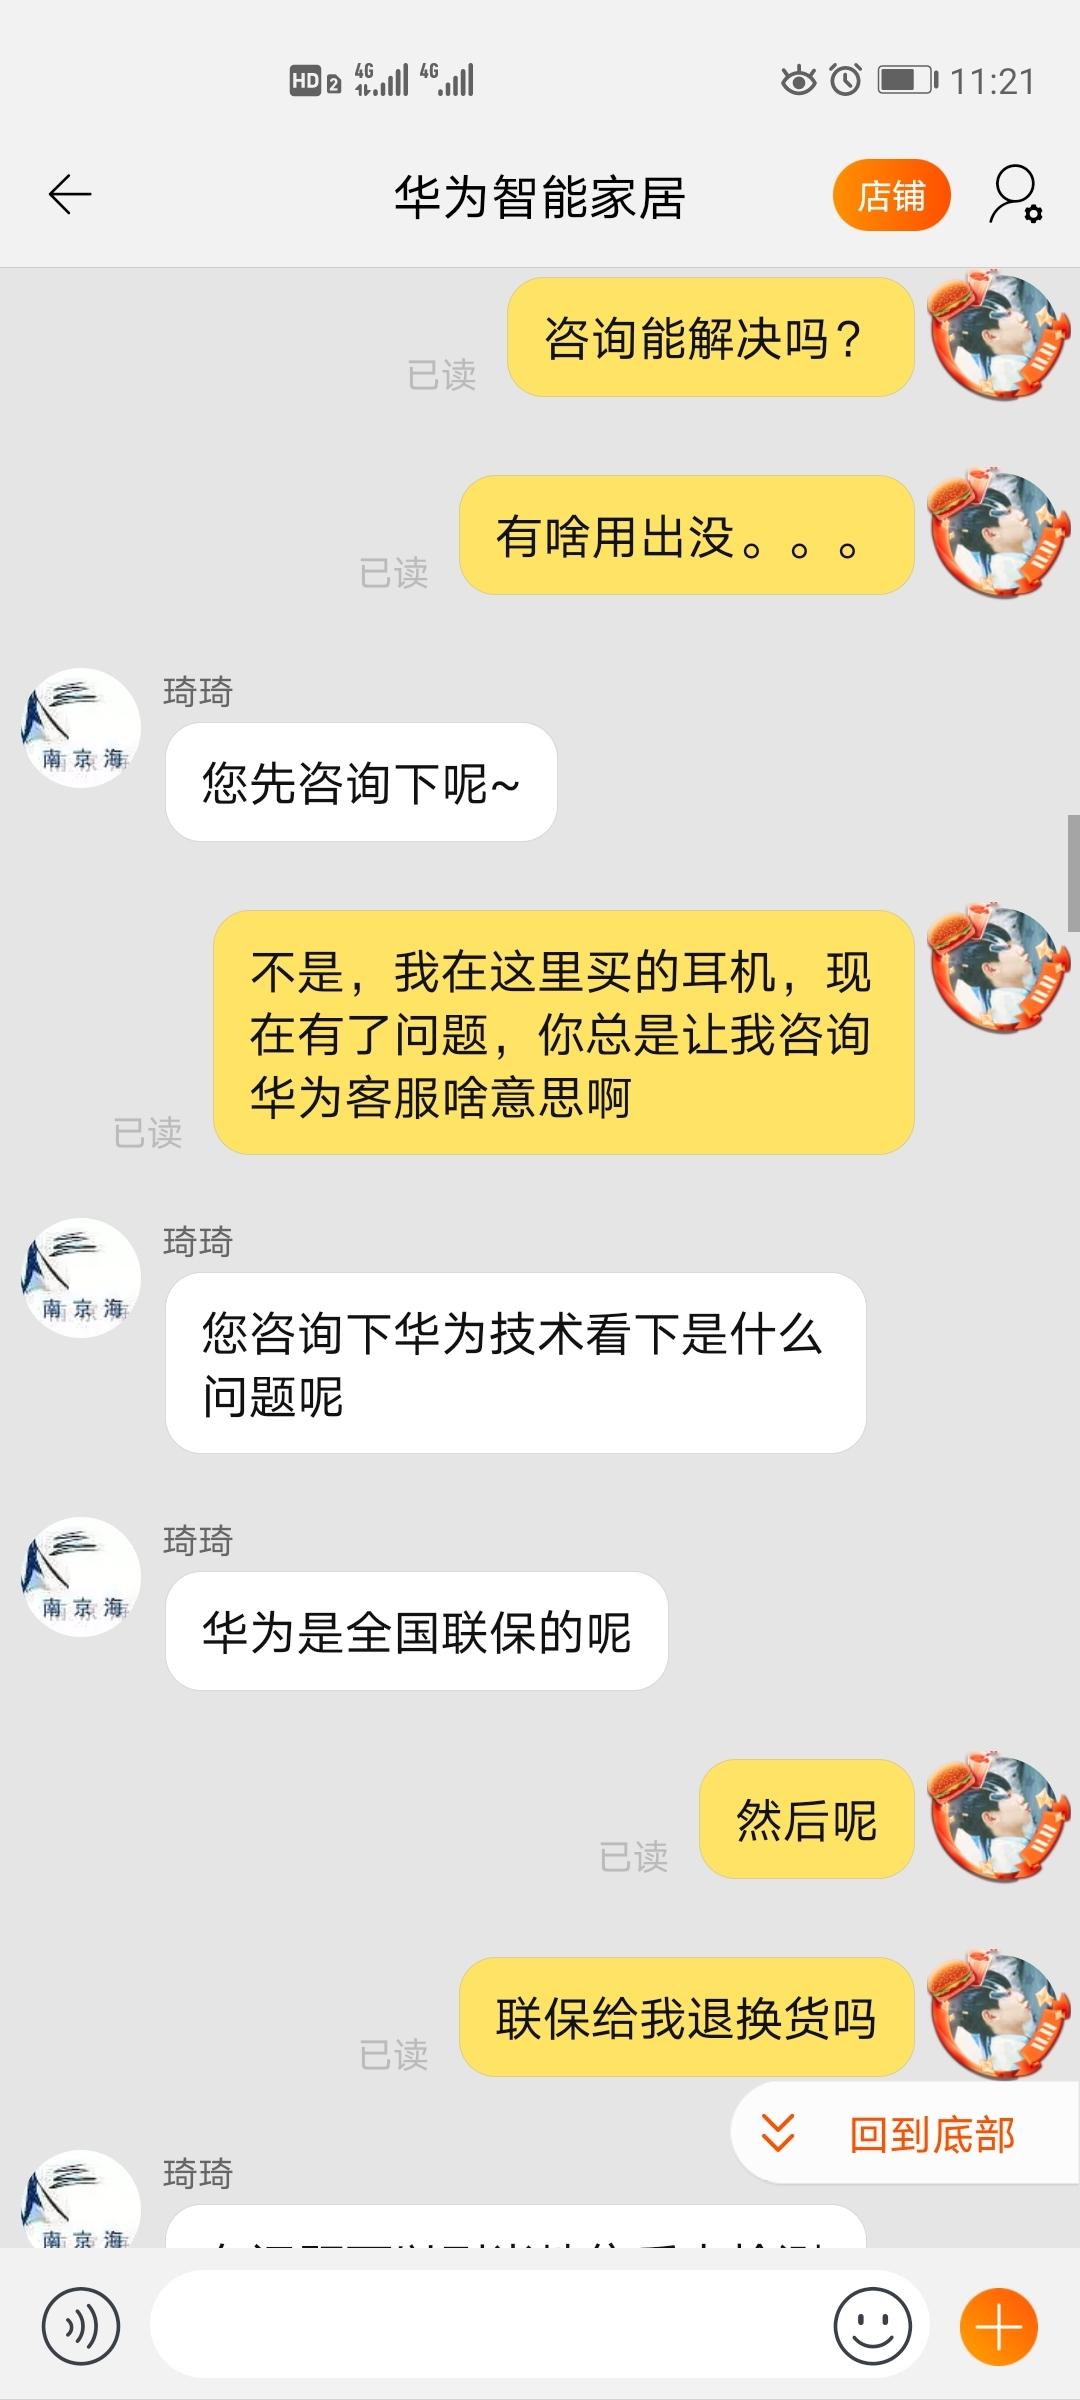 Screenshot_20200508_112130_com.taobao.taobao.jpg